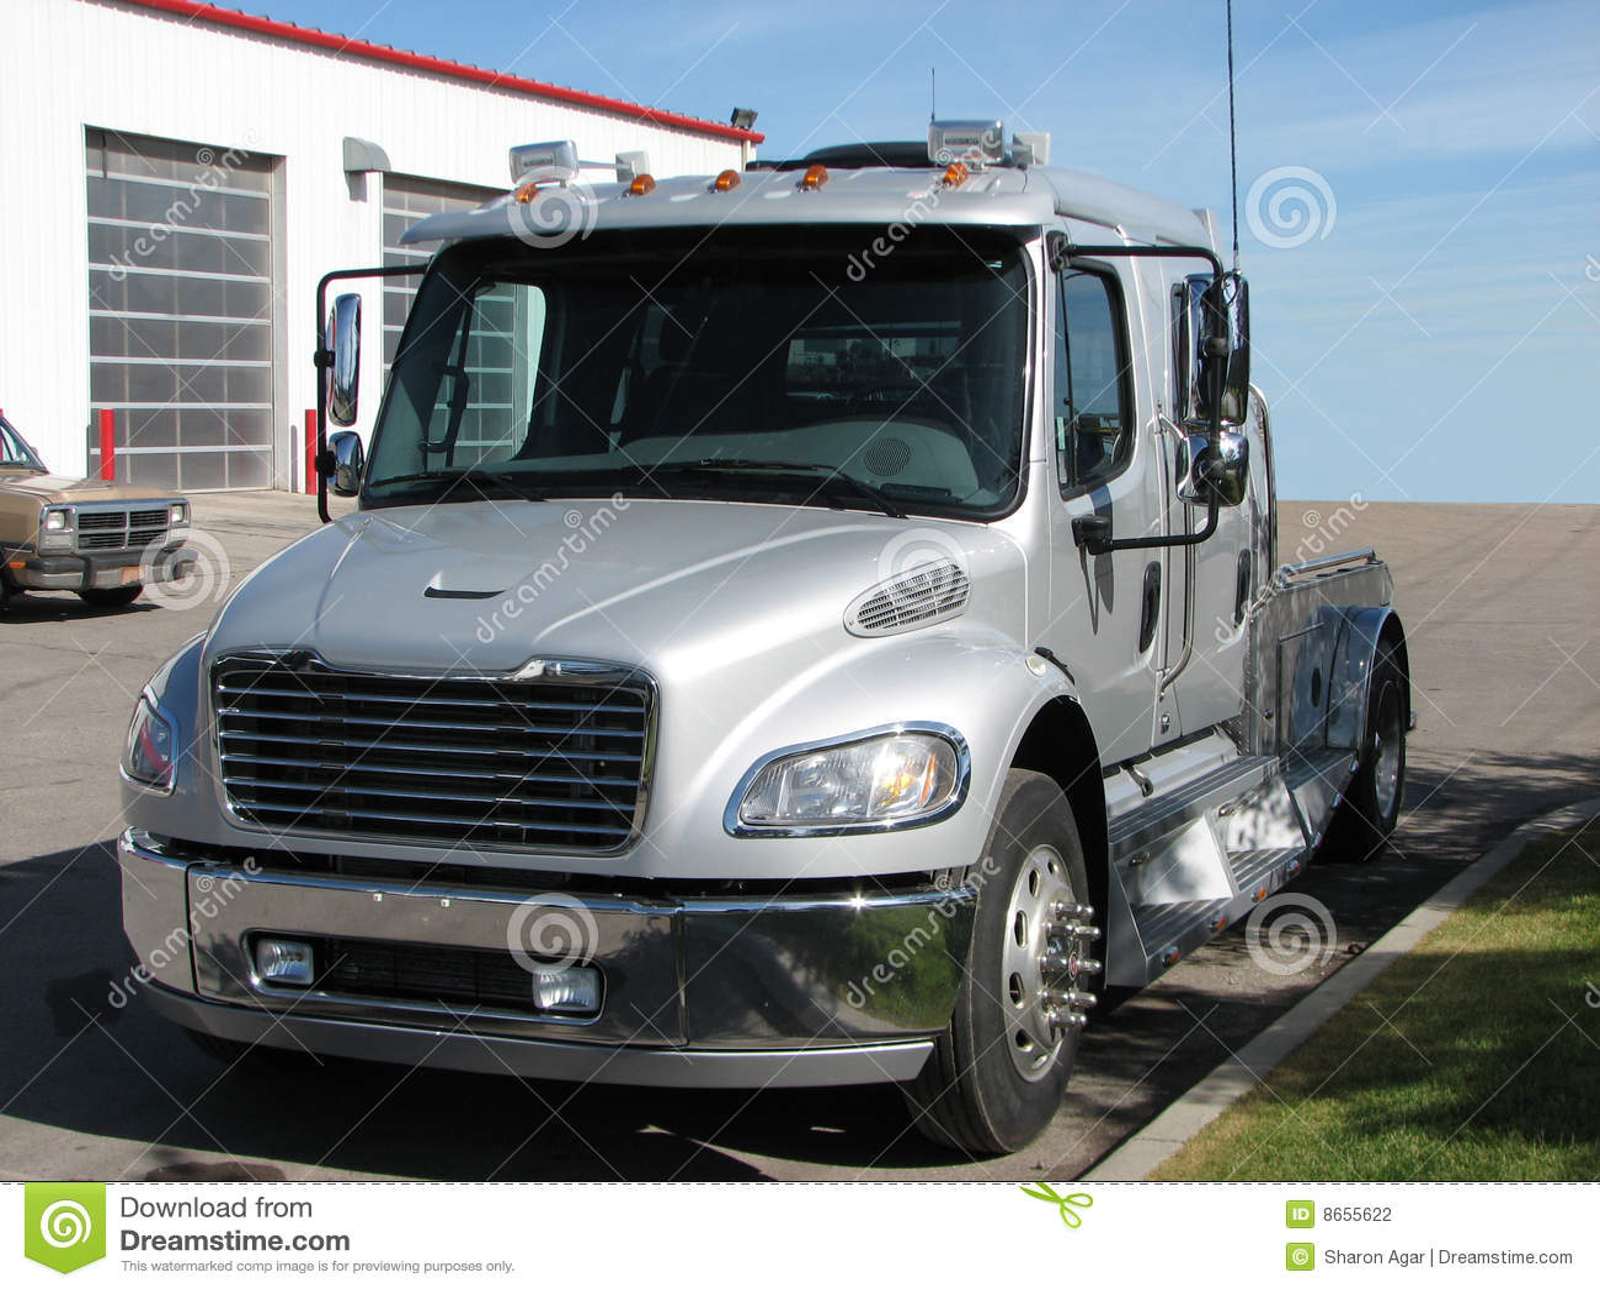 Big Truck Crew Cab 1 Stock Photography - Image: 8655622